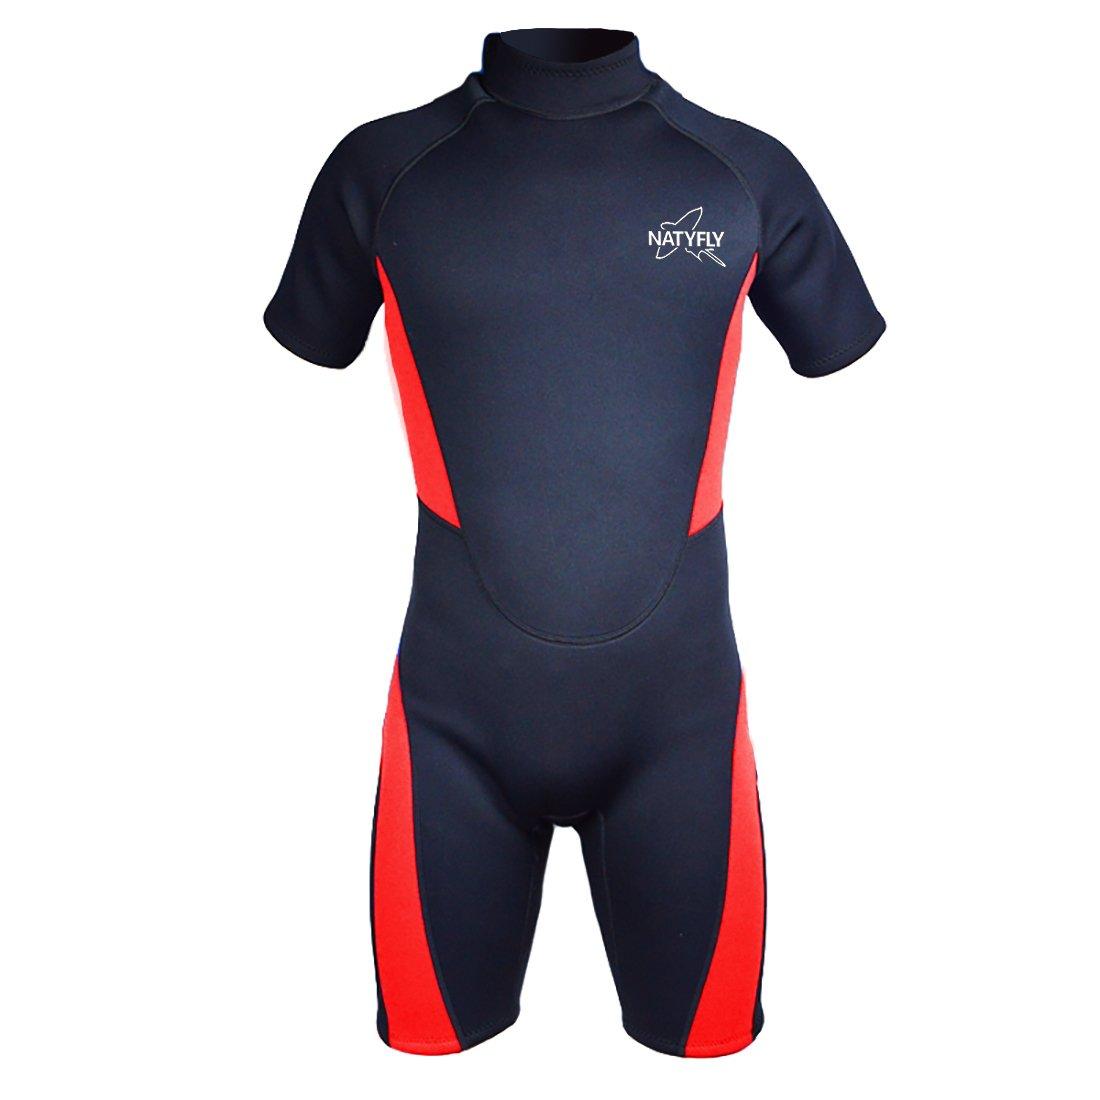 NATYFLY Wetsuit Men 3mm Neoprene Shorty Surfing Wetsuits for Women (Red/Shorty Wetsuit, XL) by NATYFLY